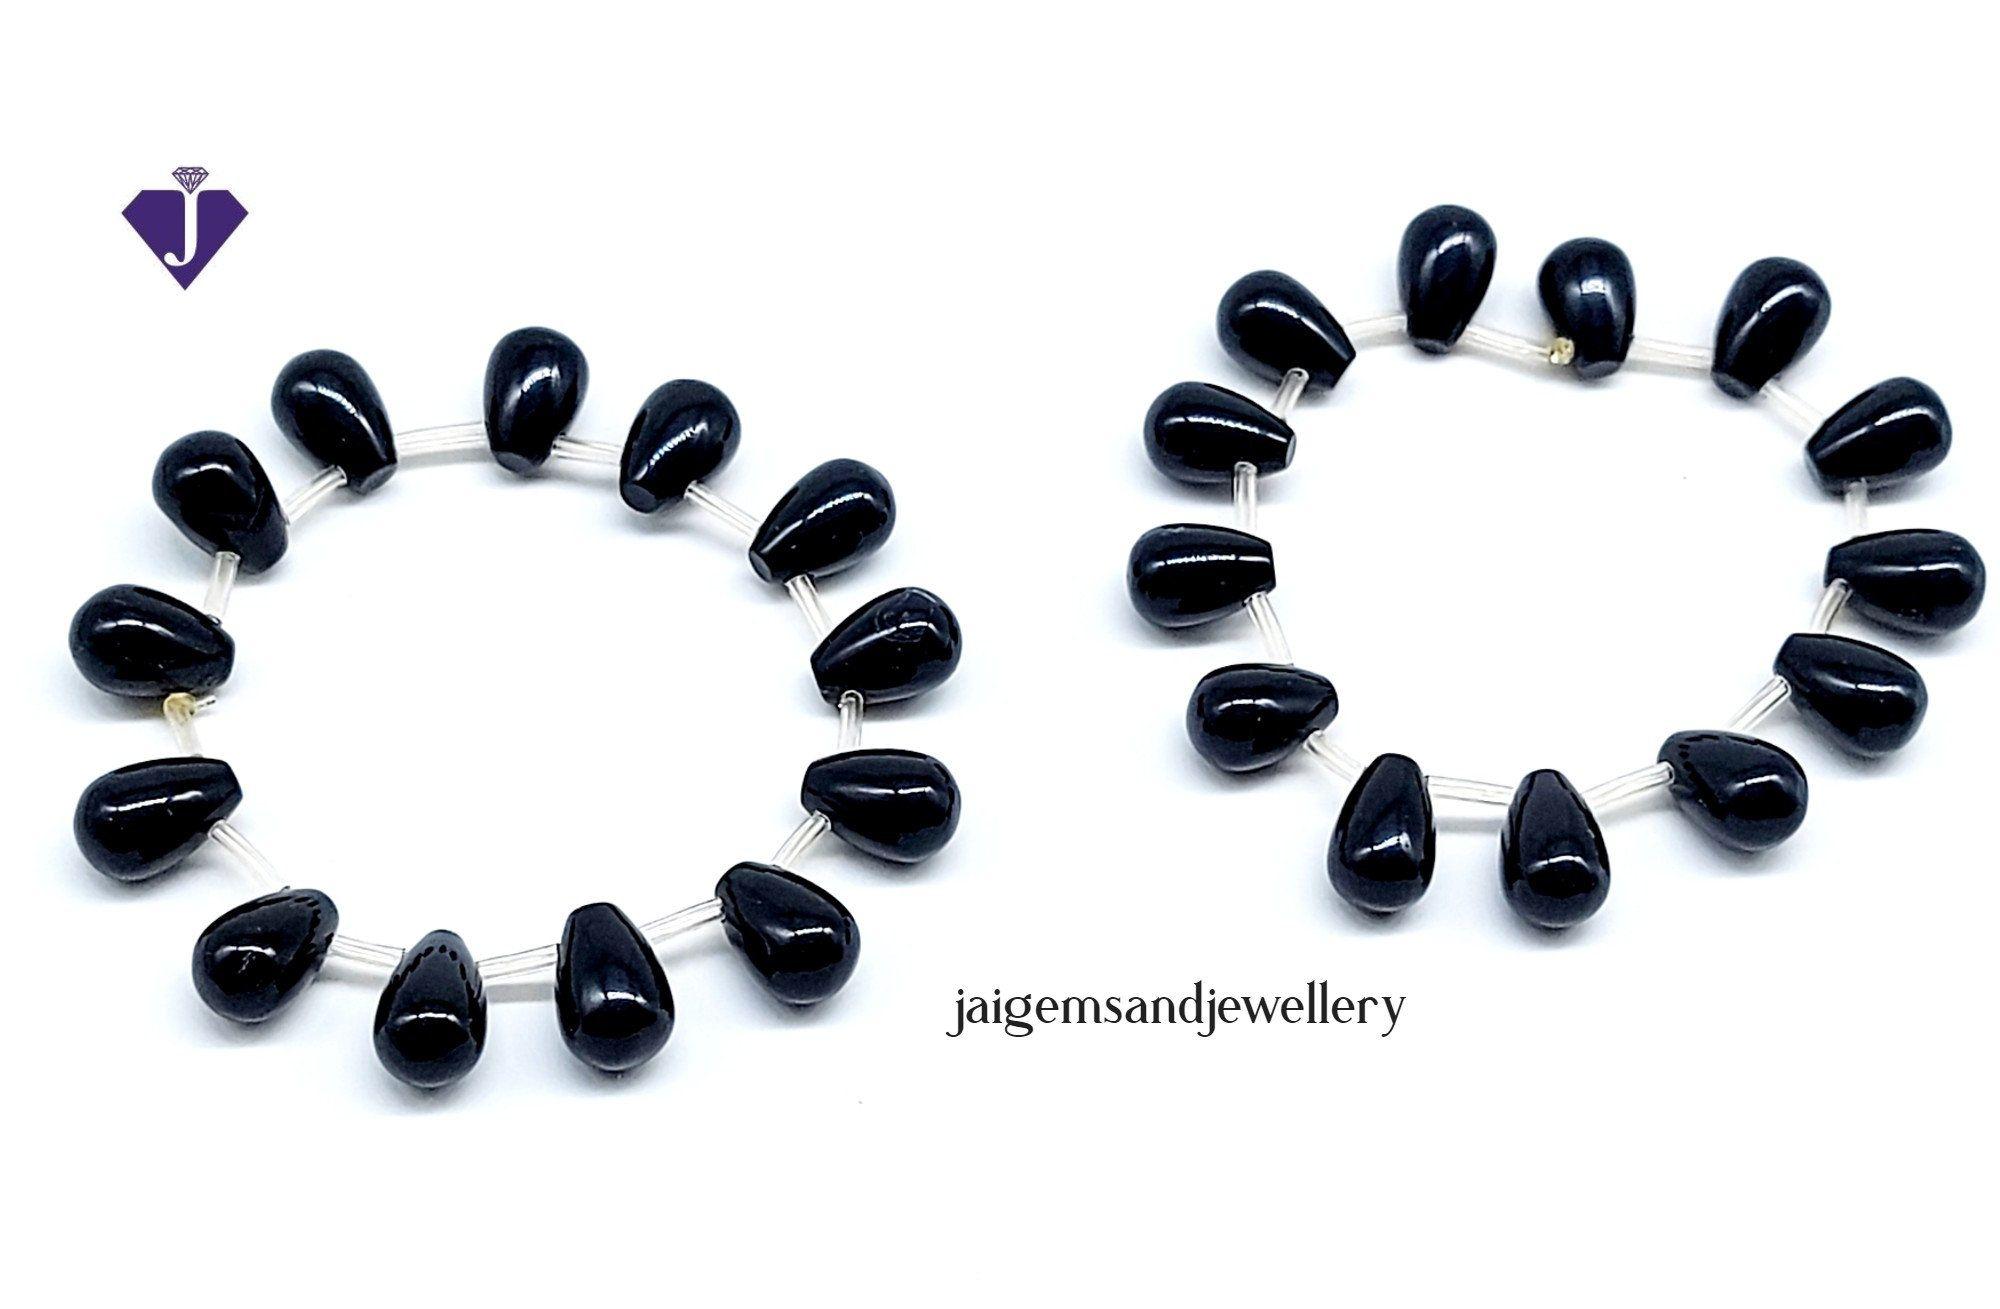 Stunning Black Onyx Bracelet With Drop Shape Beads,Beautiful Black Jewellery, Free Shipping.